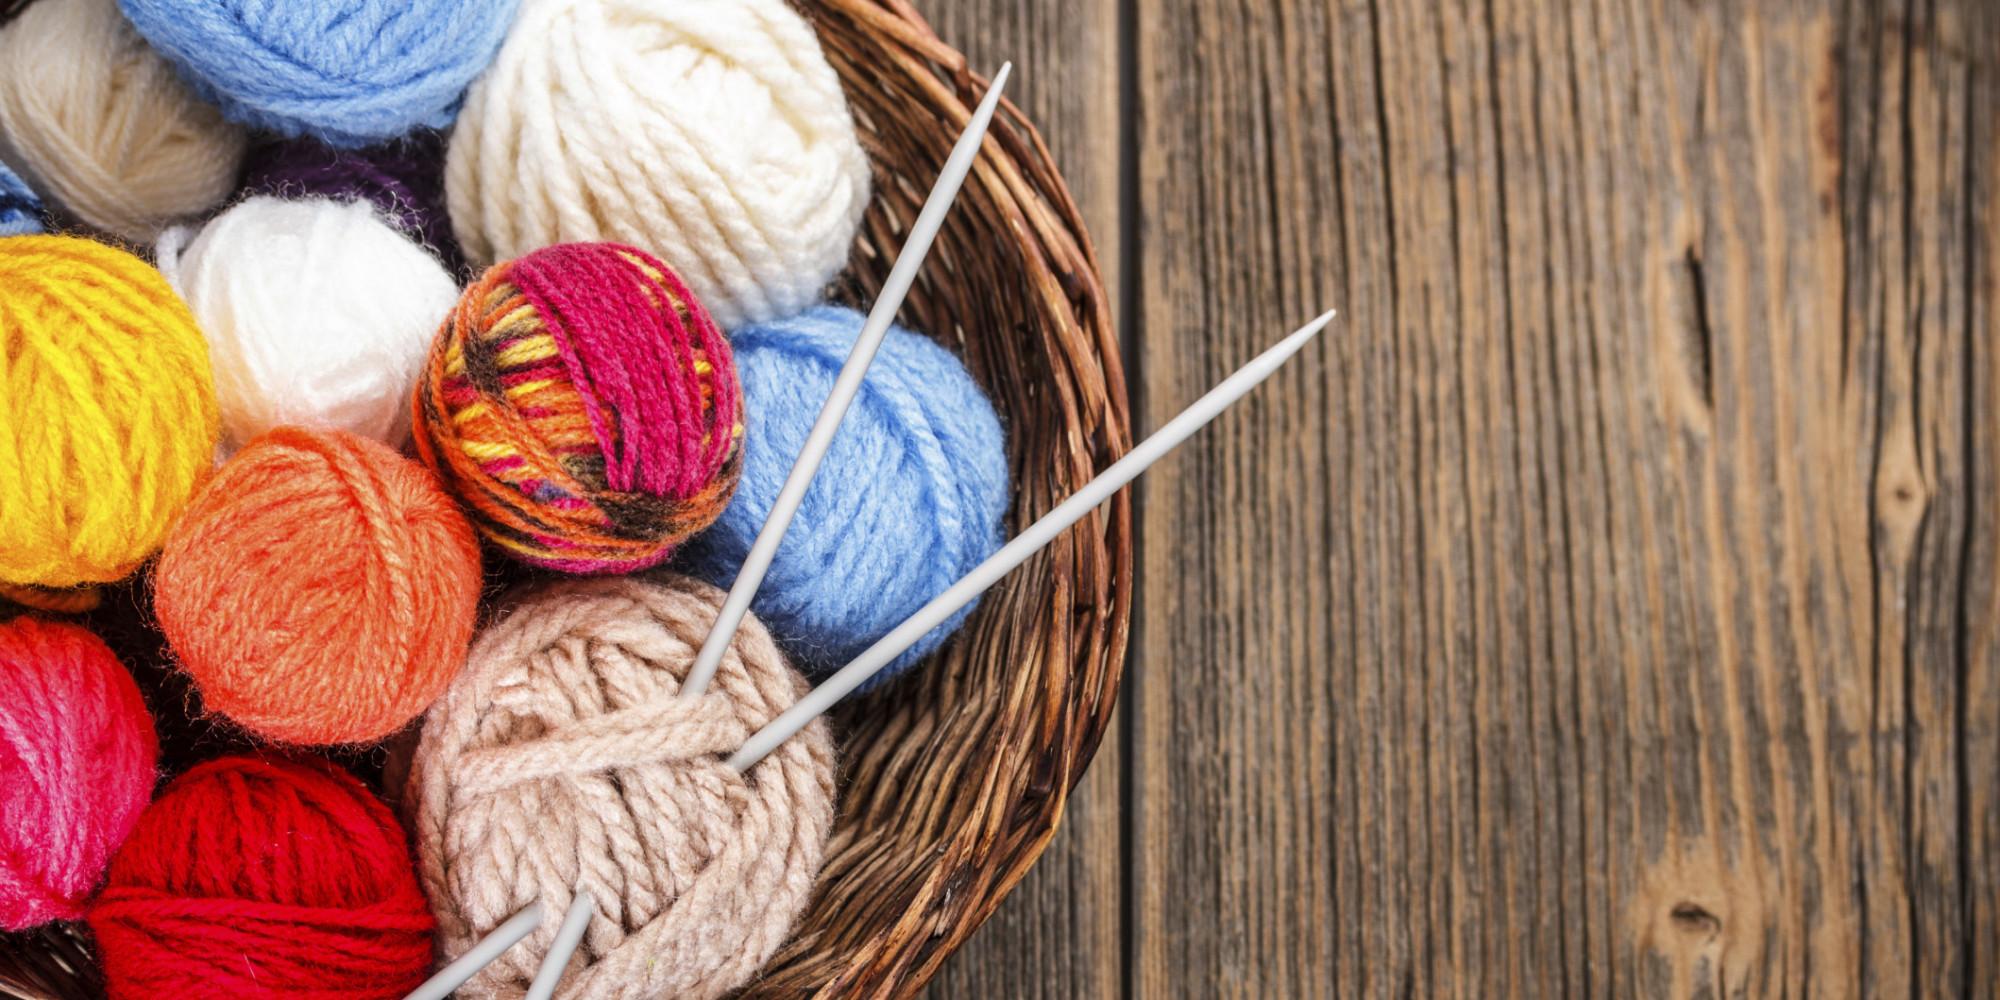 Teach-your-child-knitting.jpg